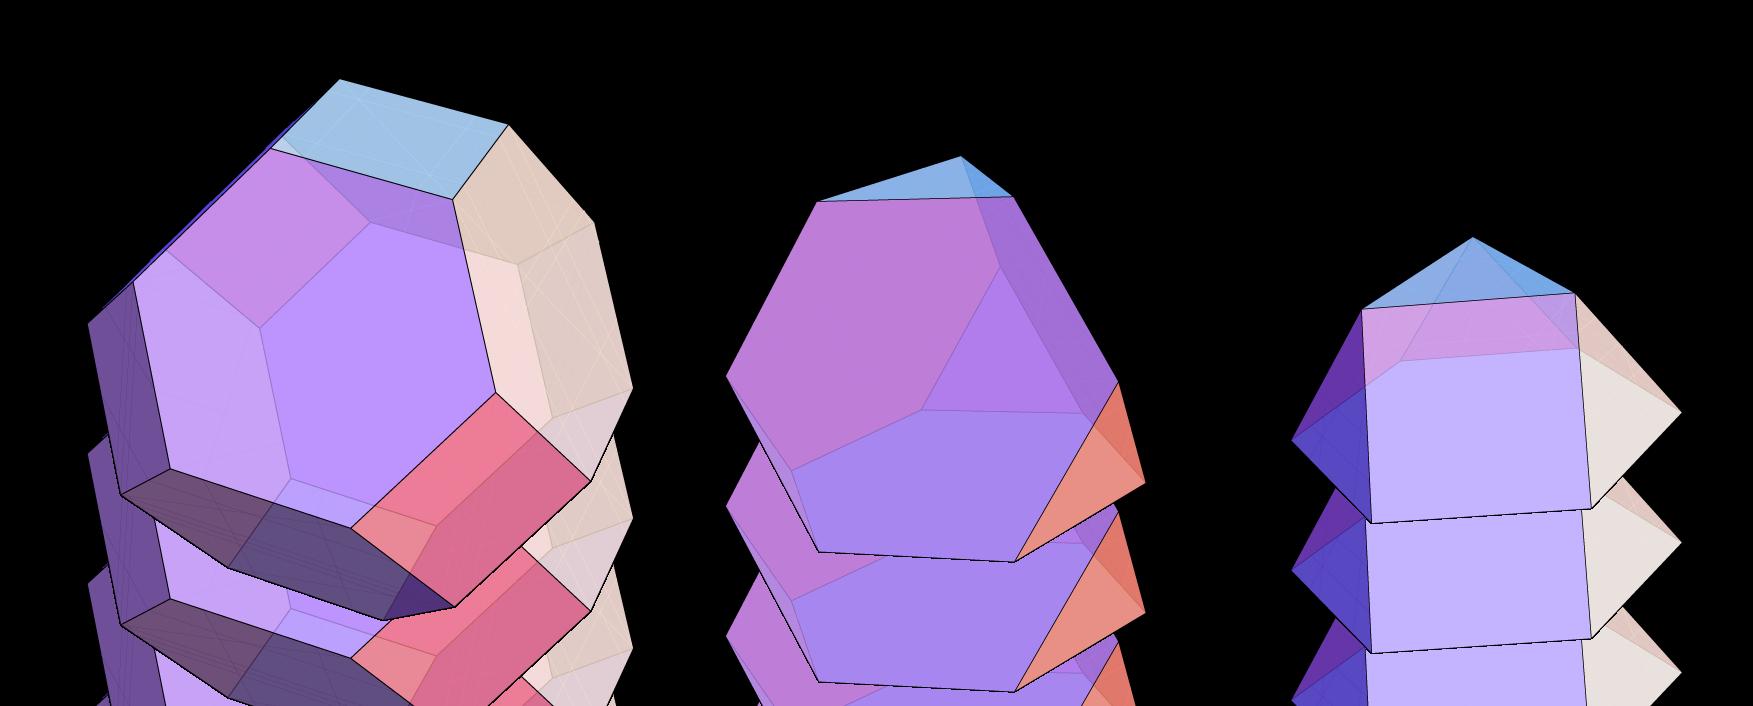 Oktaederstumpf, Tetraederstumpf, 3-Kuppel